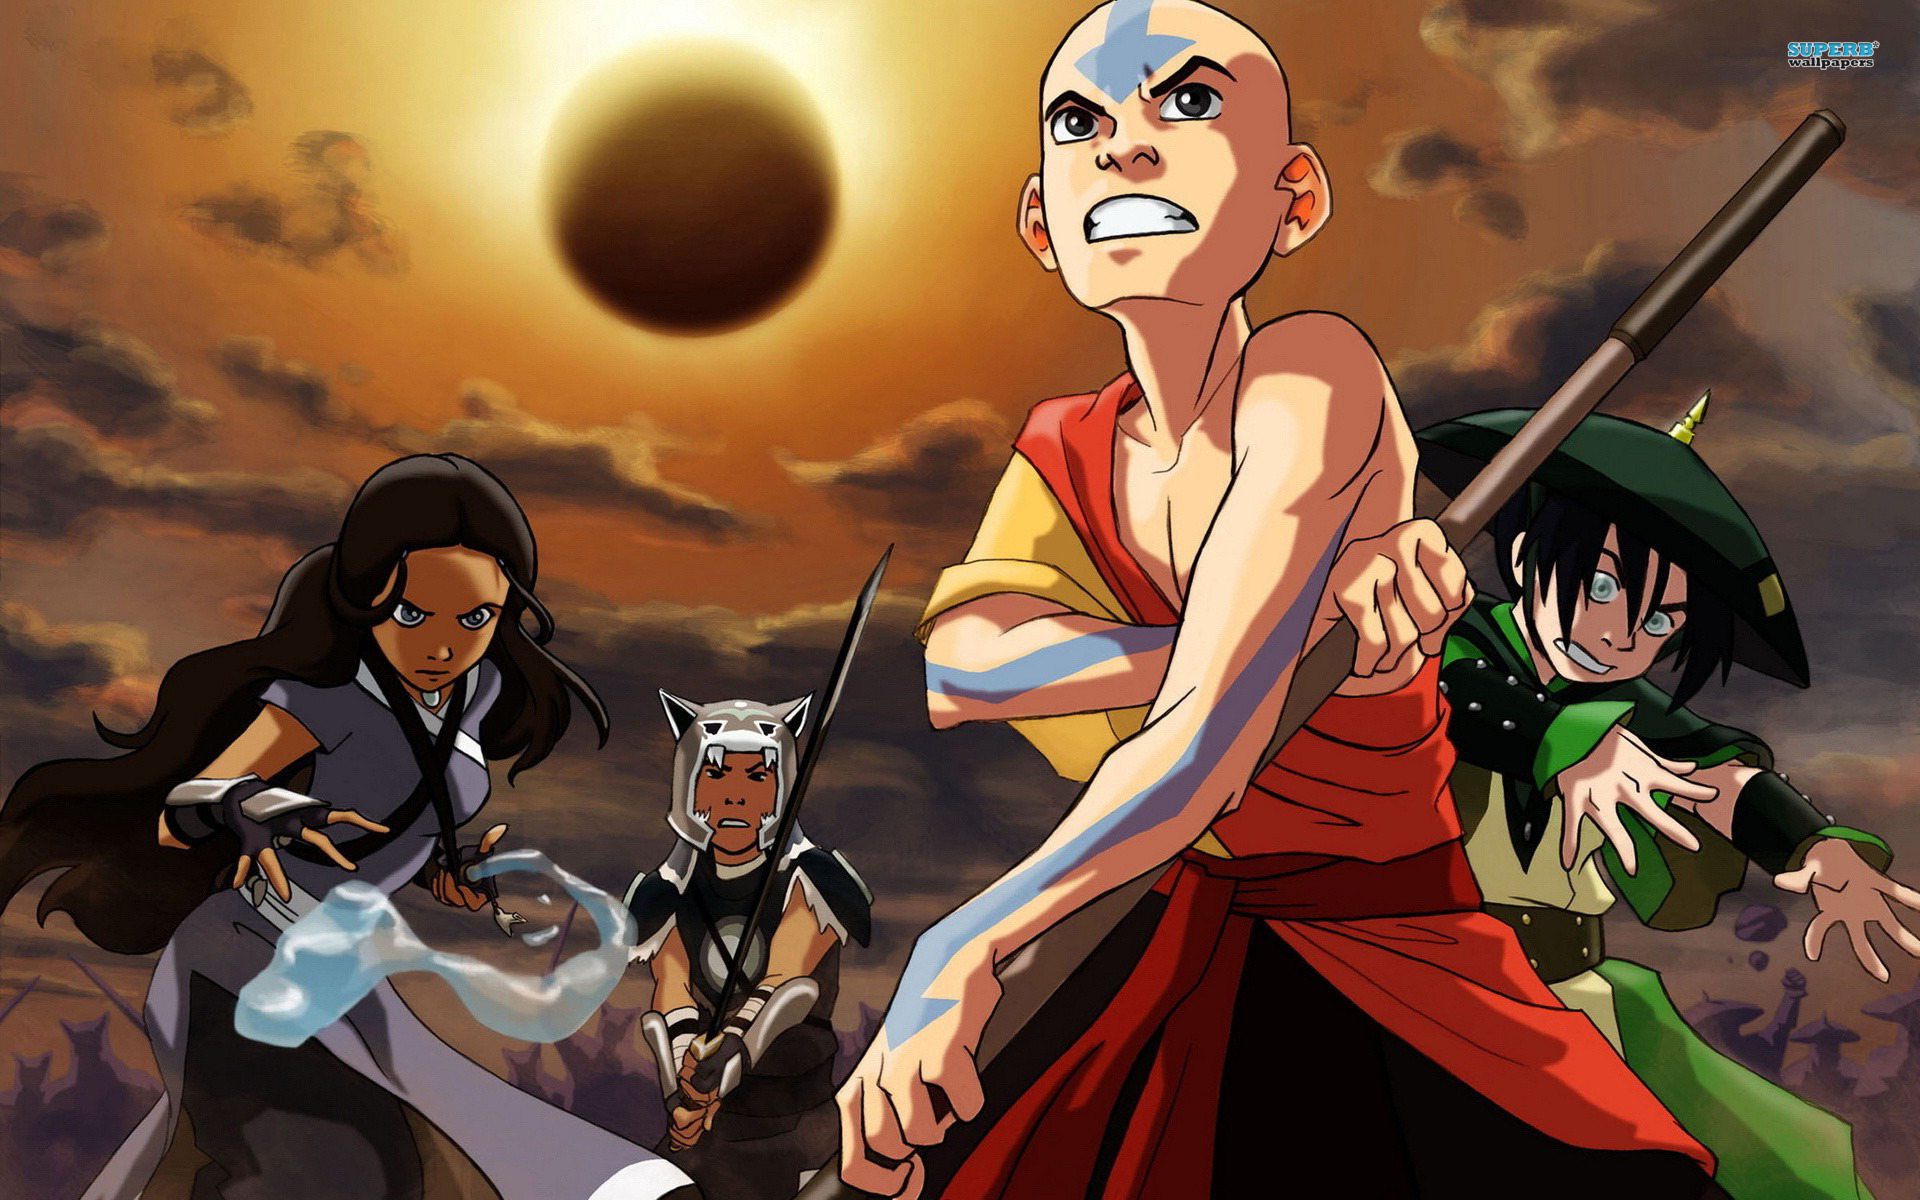 Avatar The Last Airbender Wallpaper Anime 3236 Anime   bwallescom 1920x1200